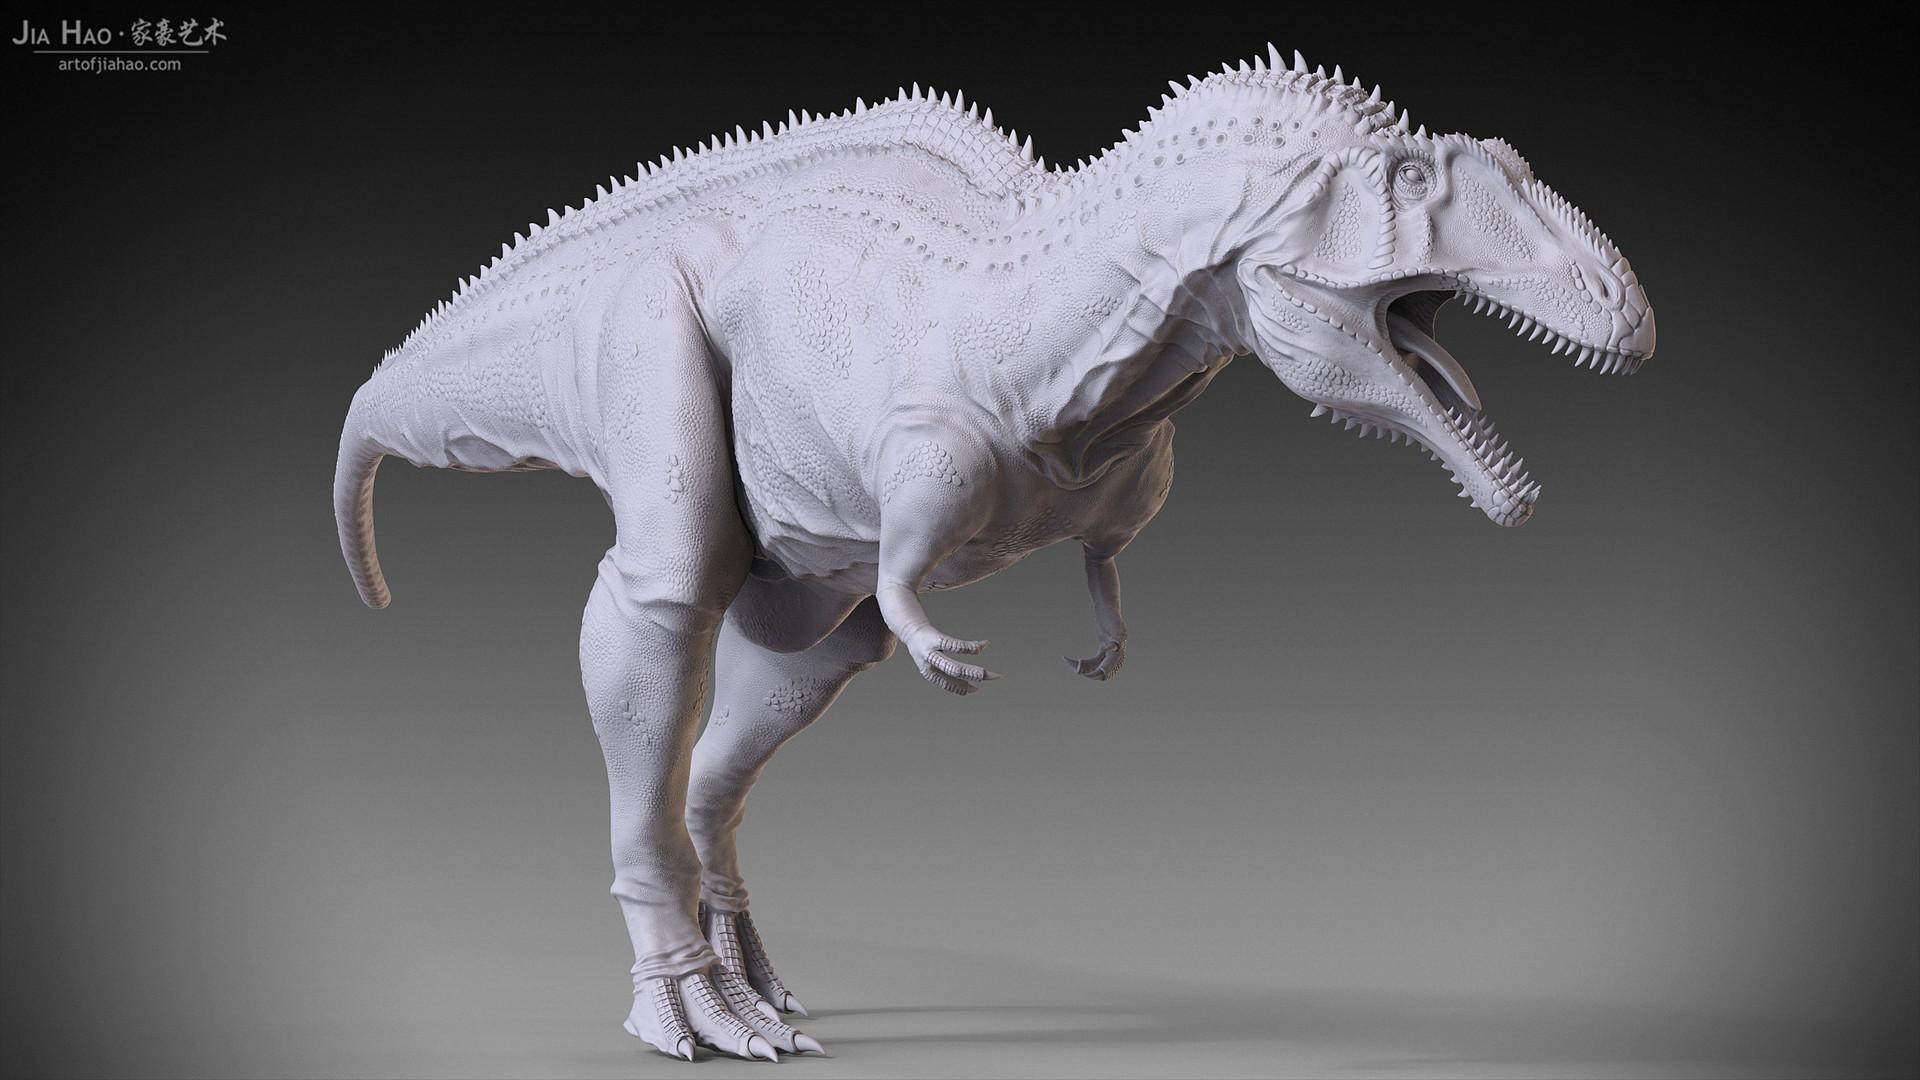 Jia hao acrocanthosaurus 01